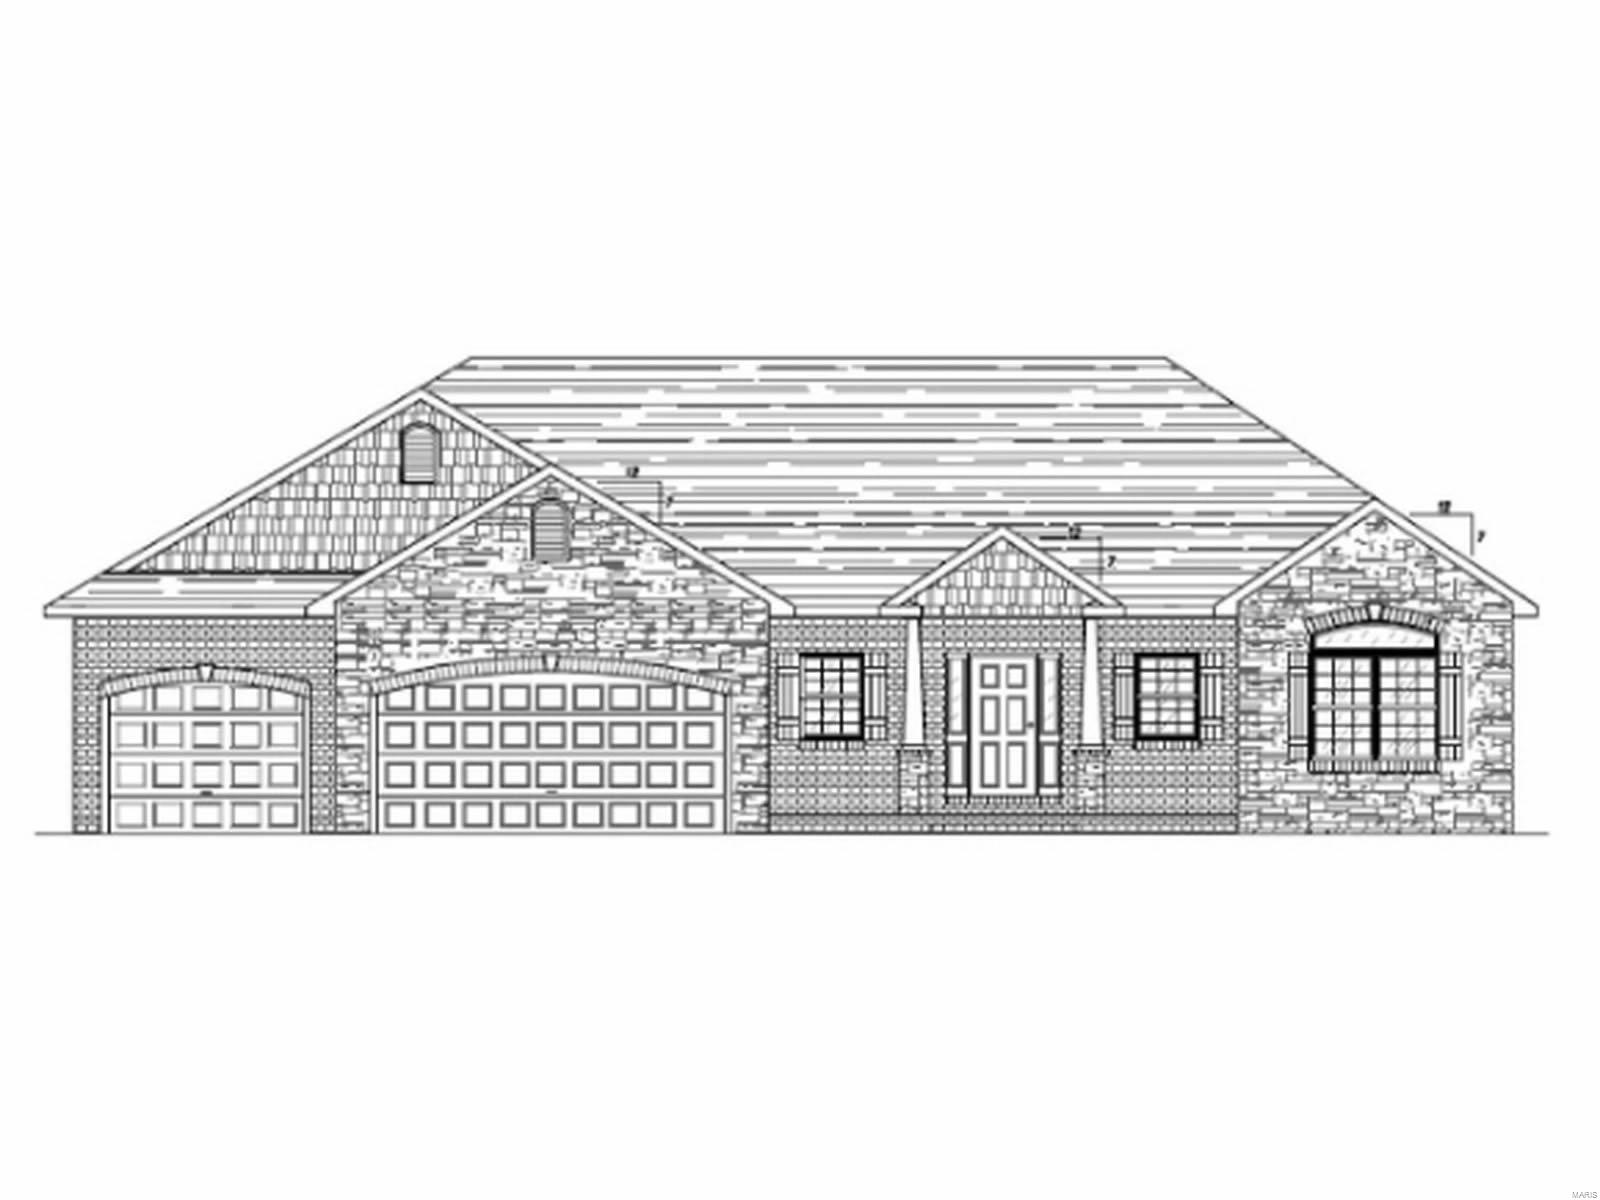 1598 Canvas Back Drive Property Photo - Staunton, IL real estate listing